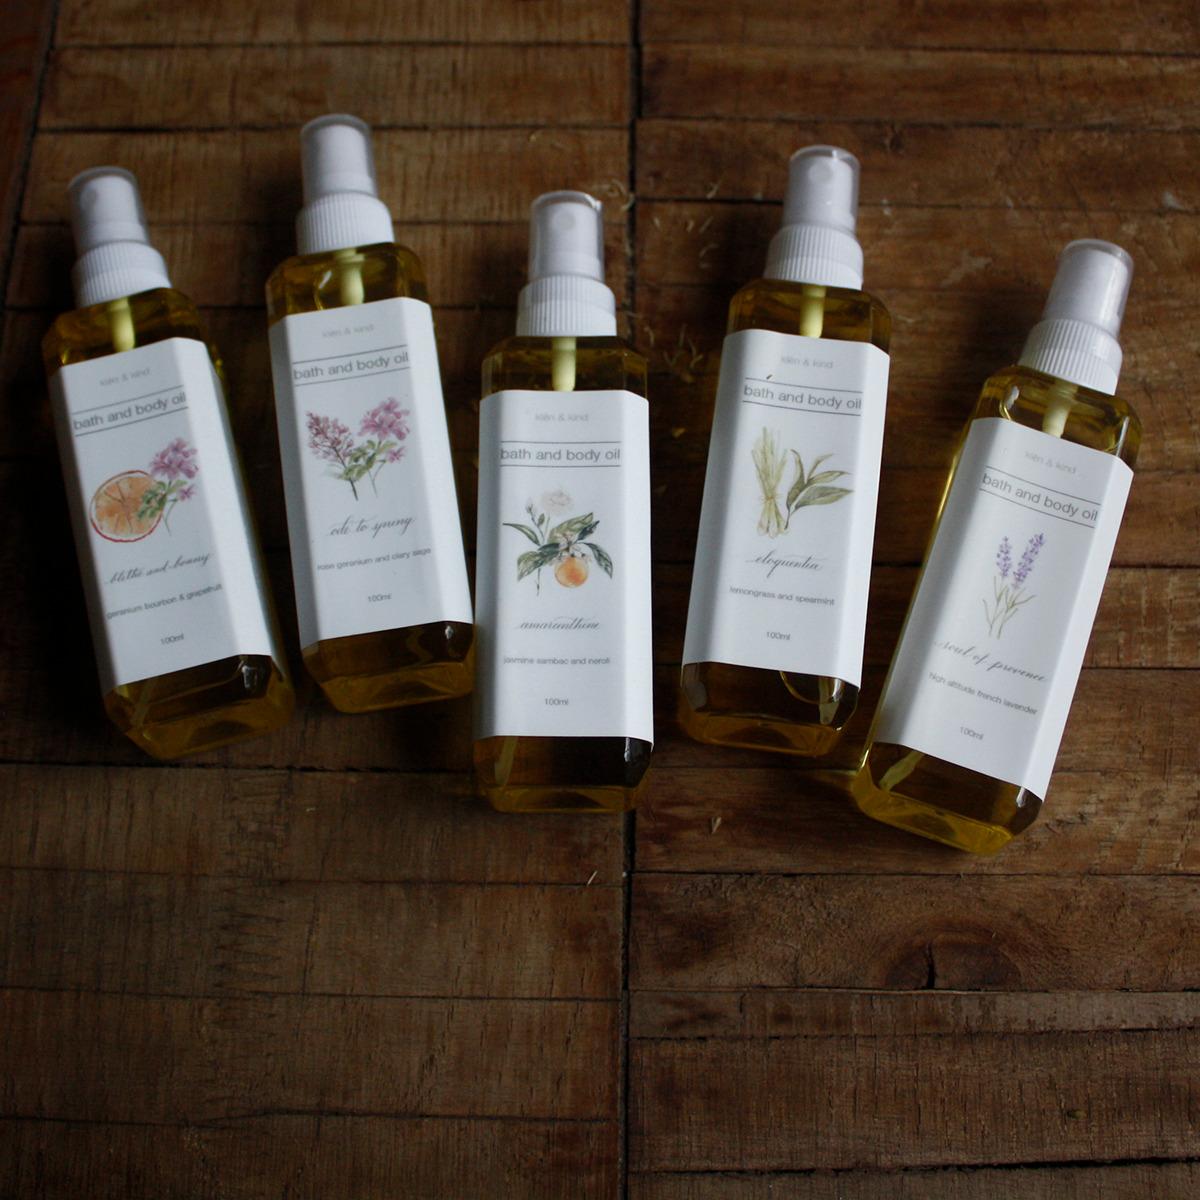 klēn and kind Amaranthine Body Oil